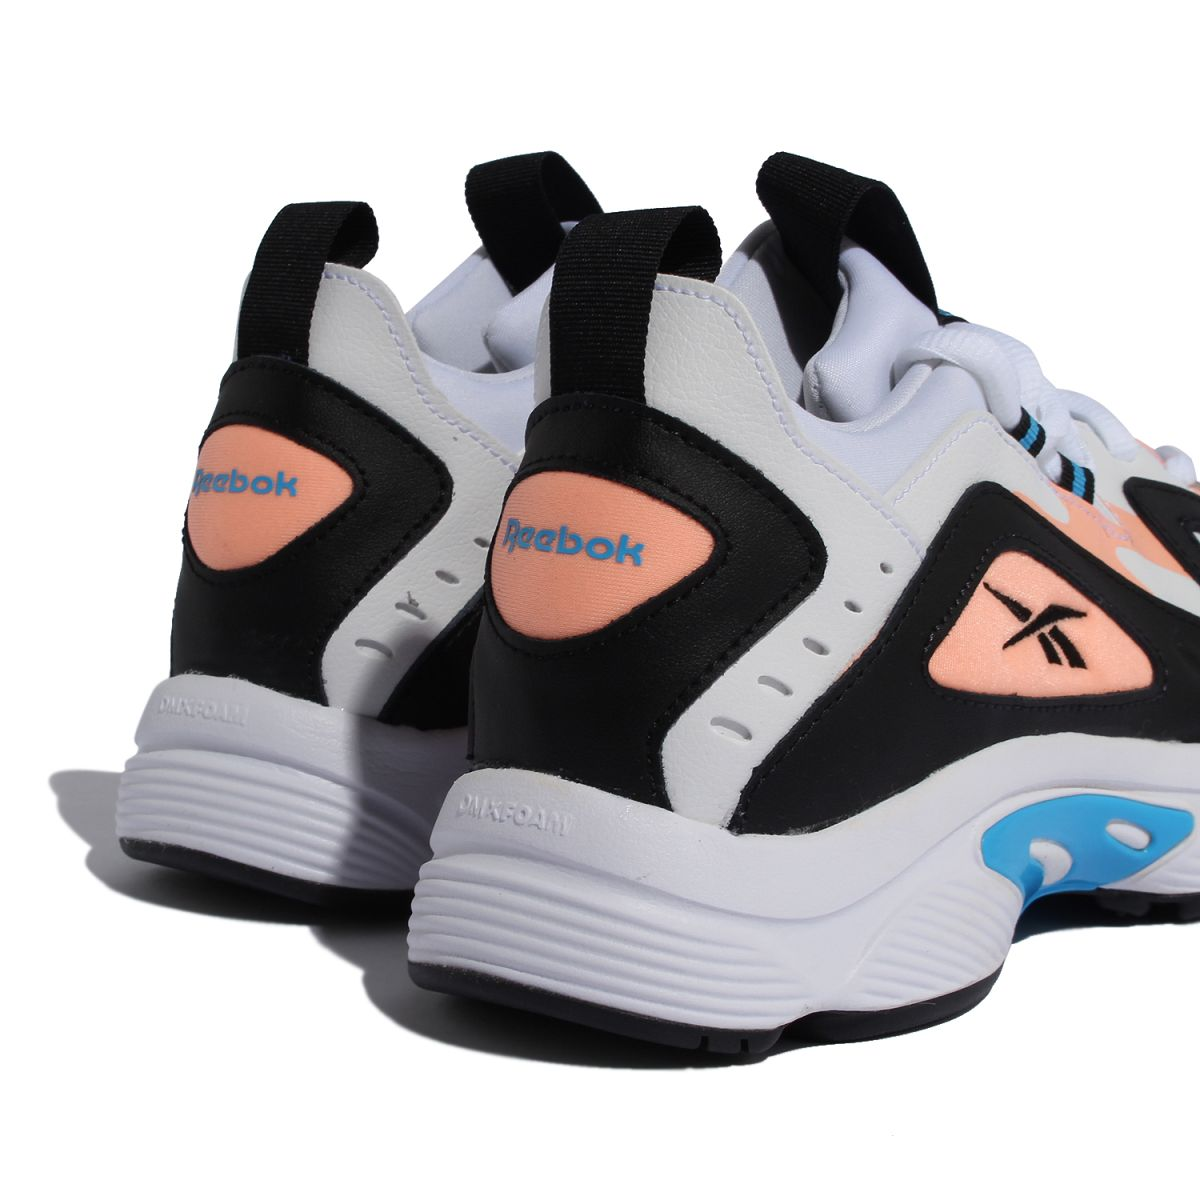 Reebok Reebok DMX SERIES 1200 LT Lady's men EH3389 classical music shoes